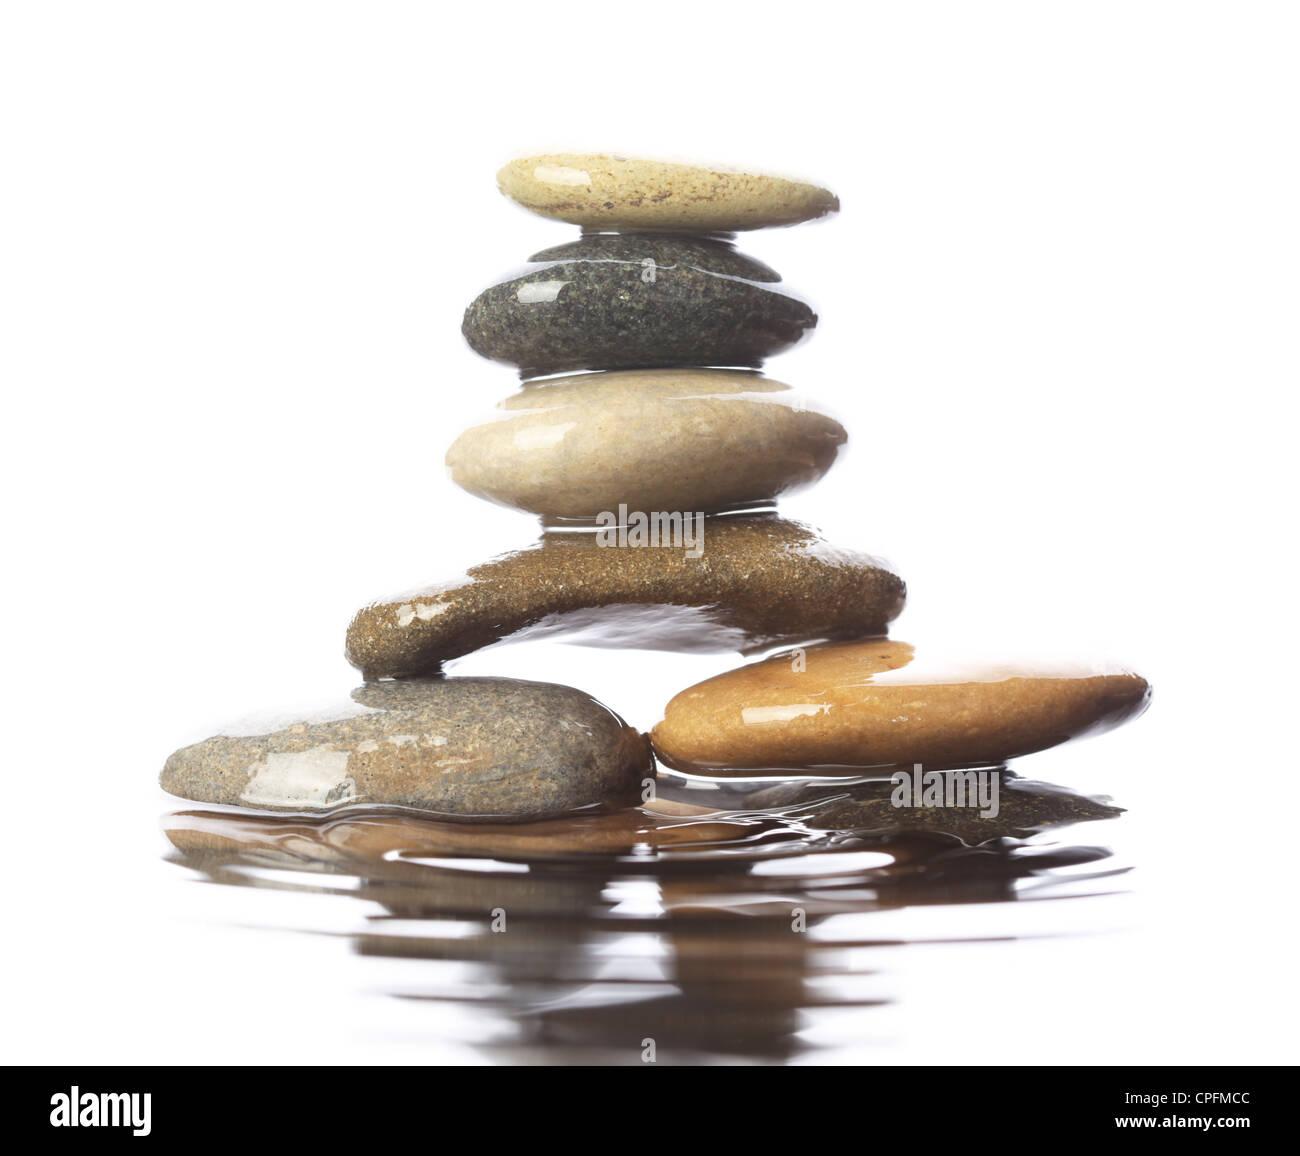 Stones in water - Stock Image